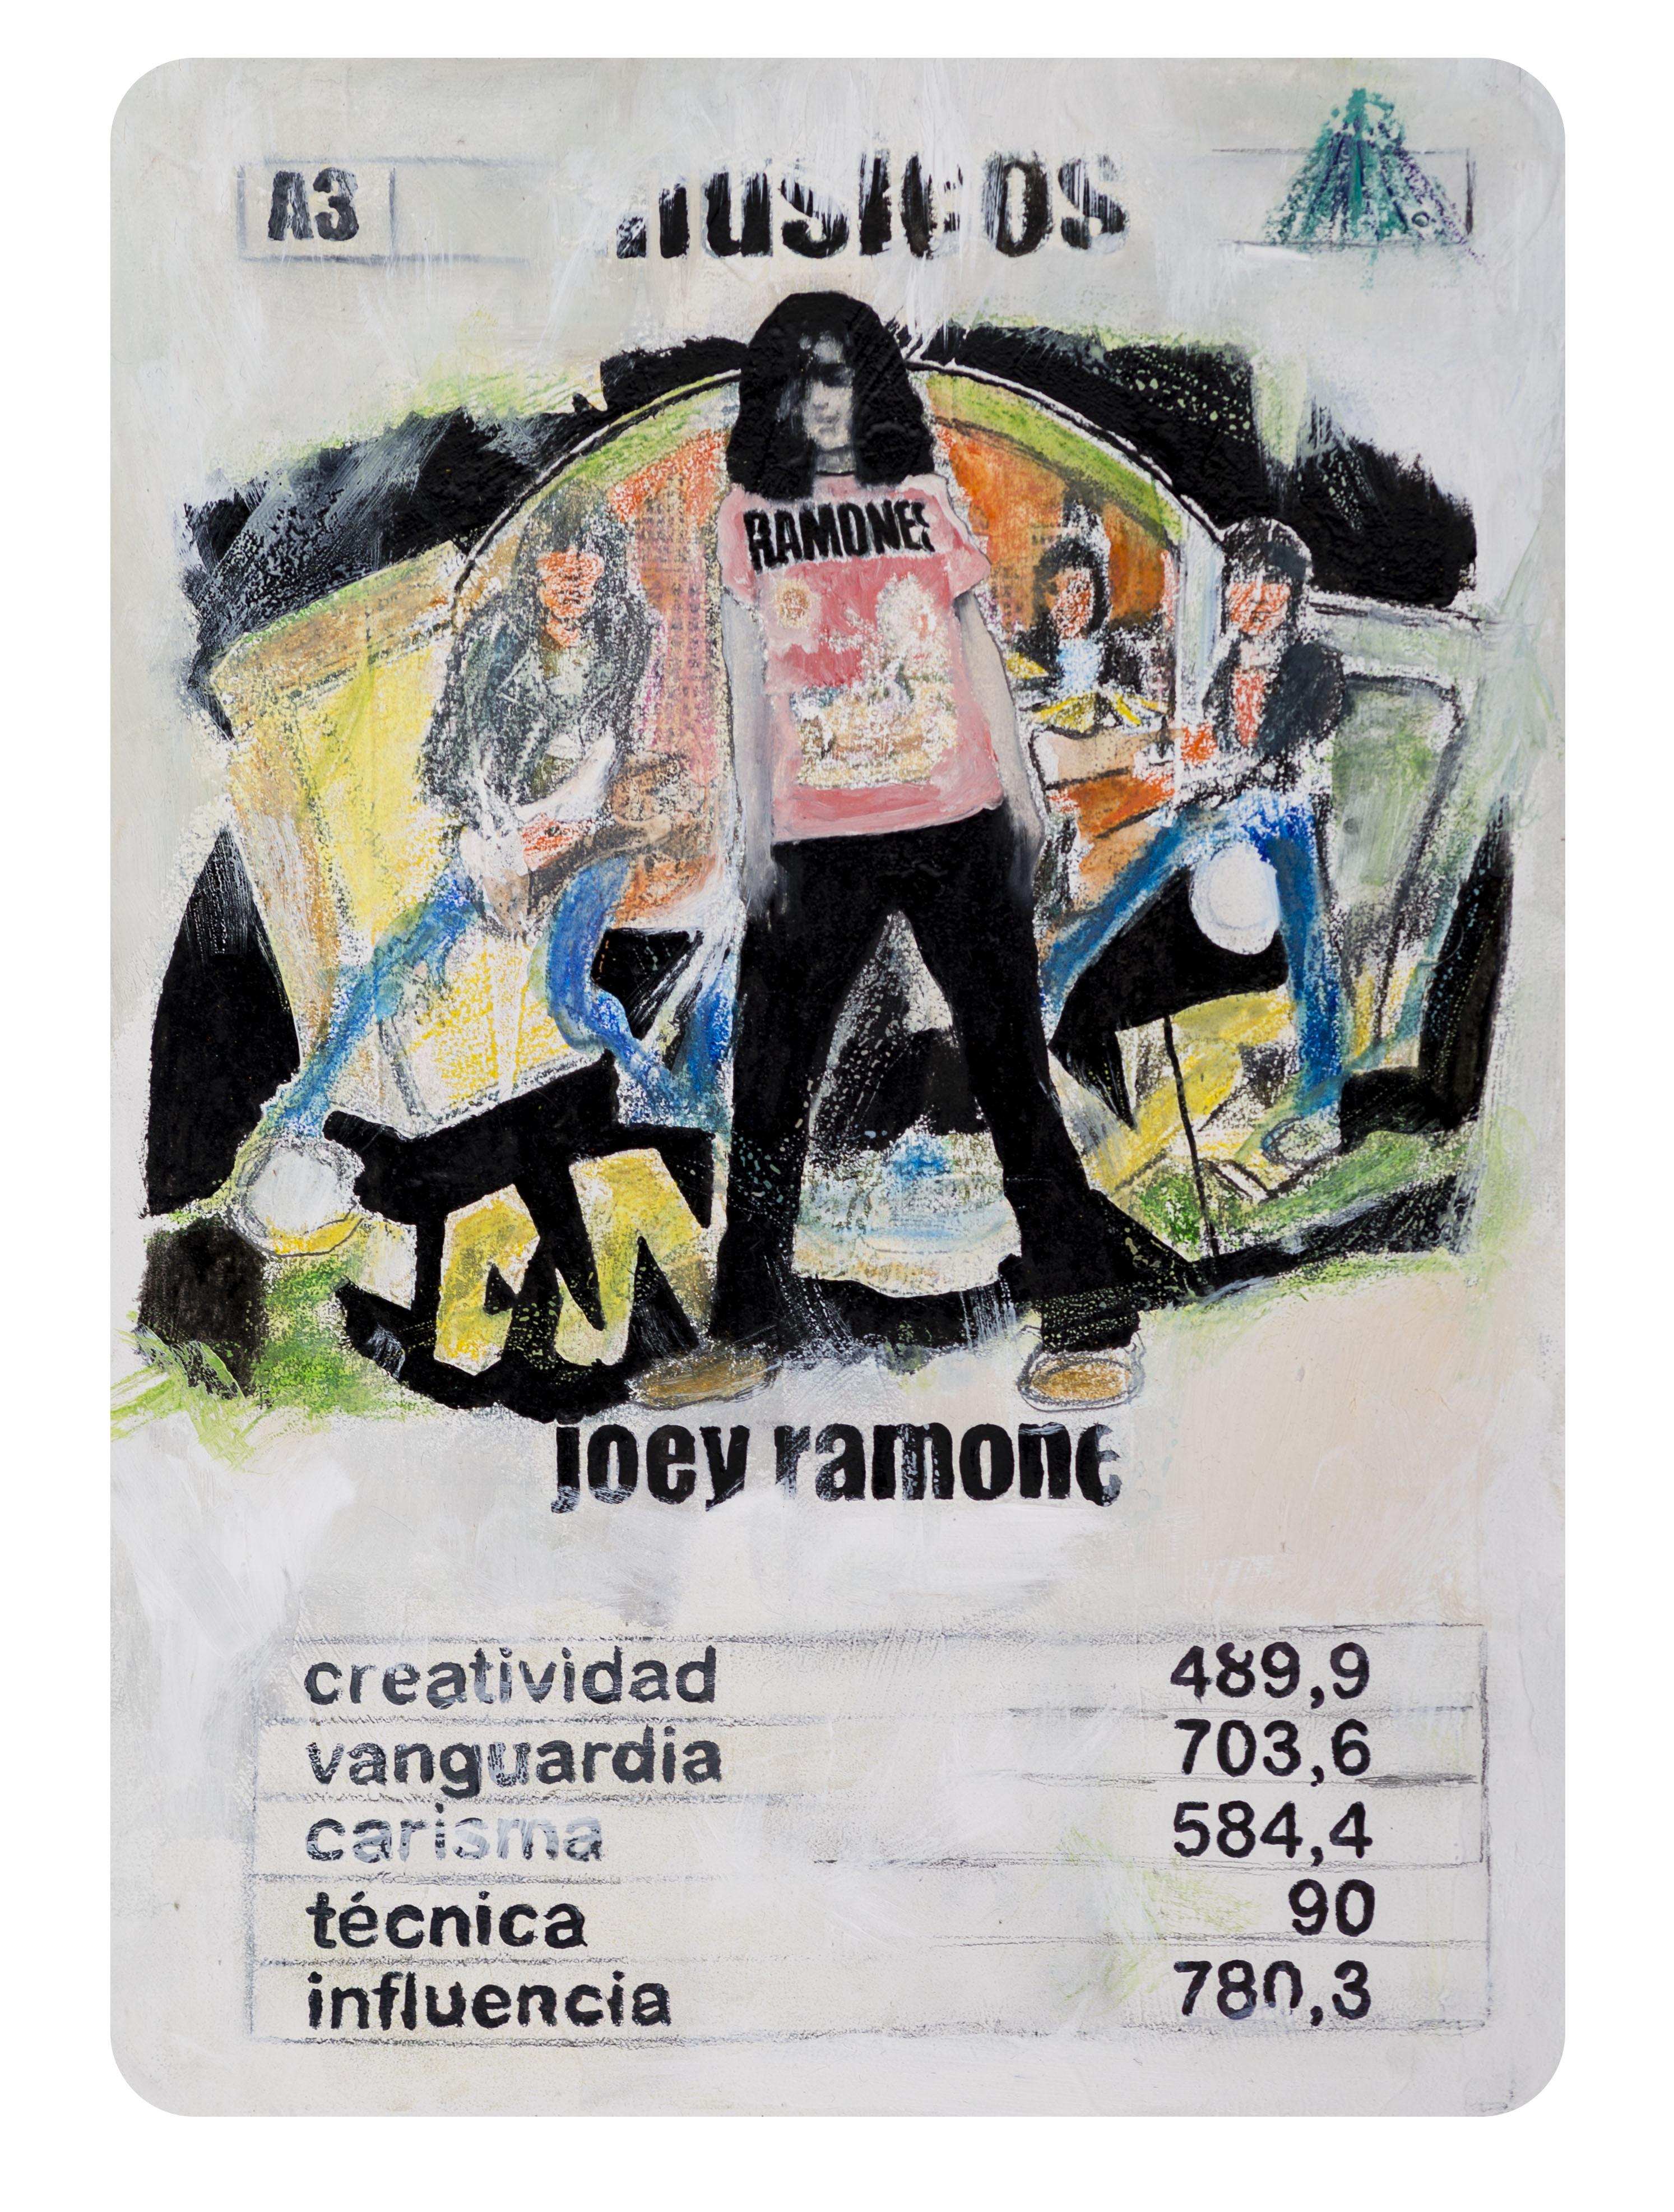 A3 Naipe Joey Ramone